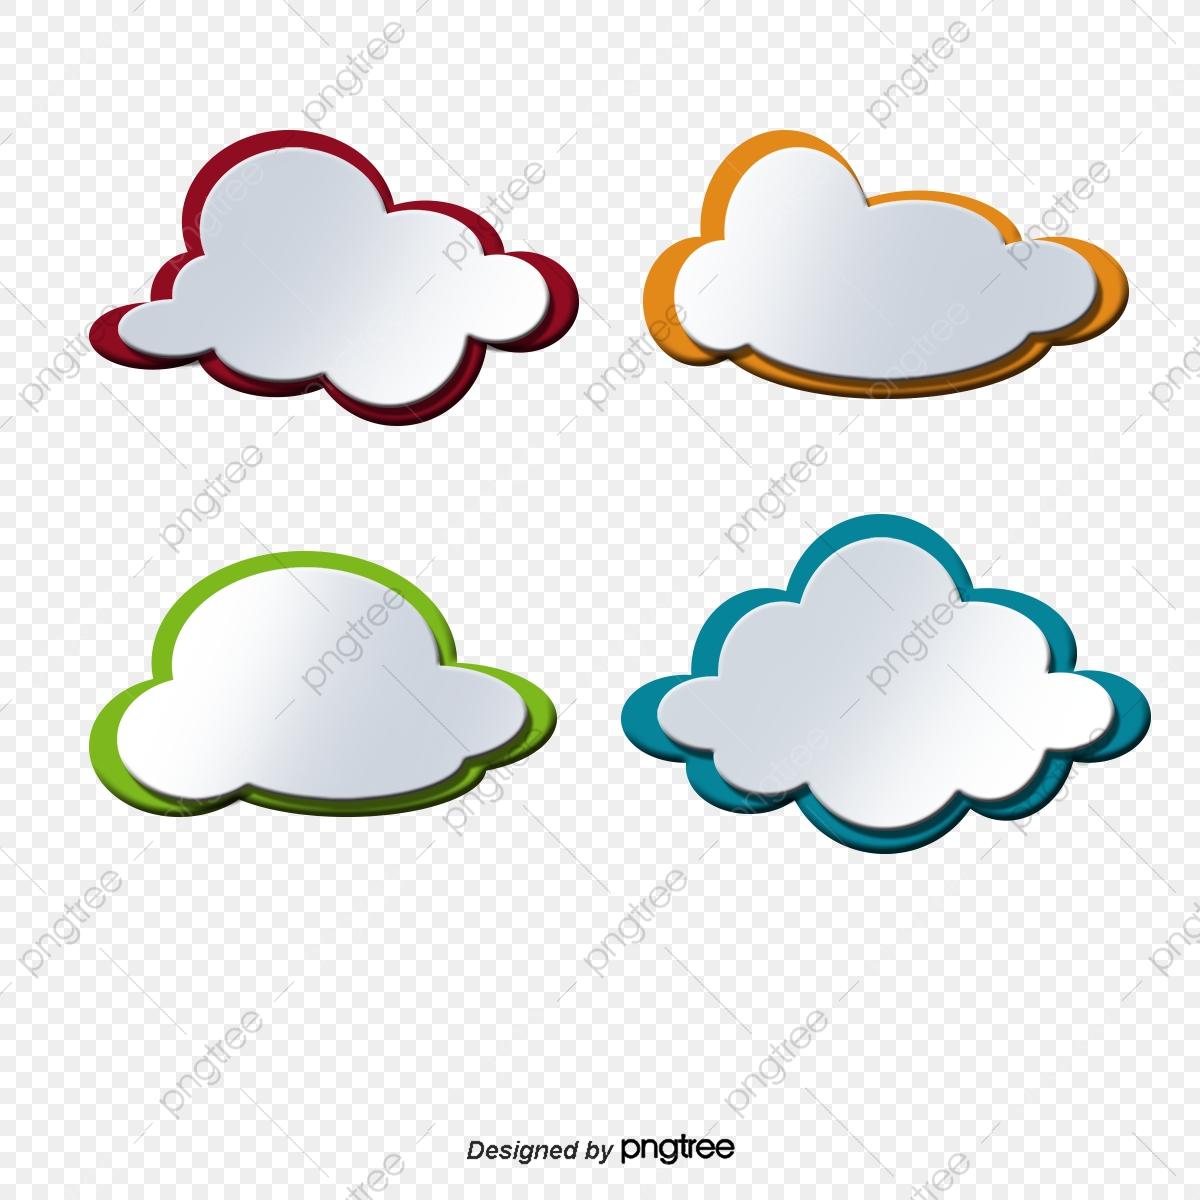 Custom Shapes Decorative Frame, Customize, Shape, Decoration PNG.